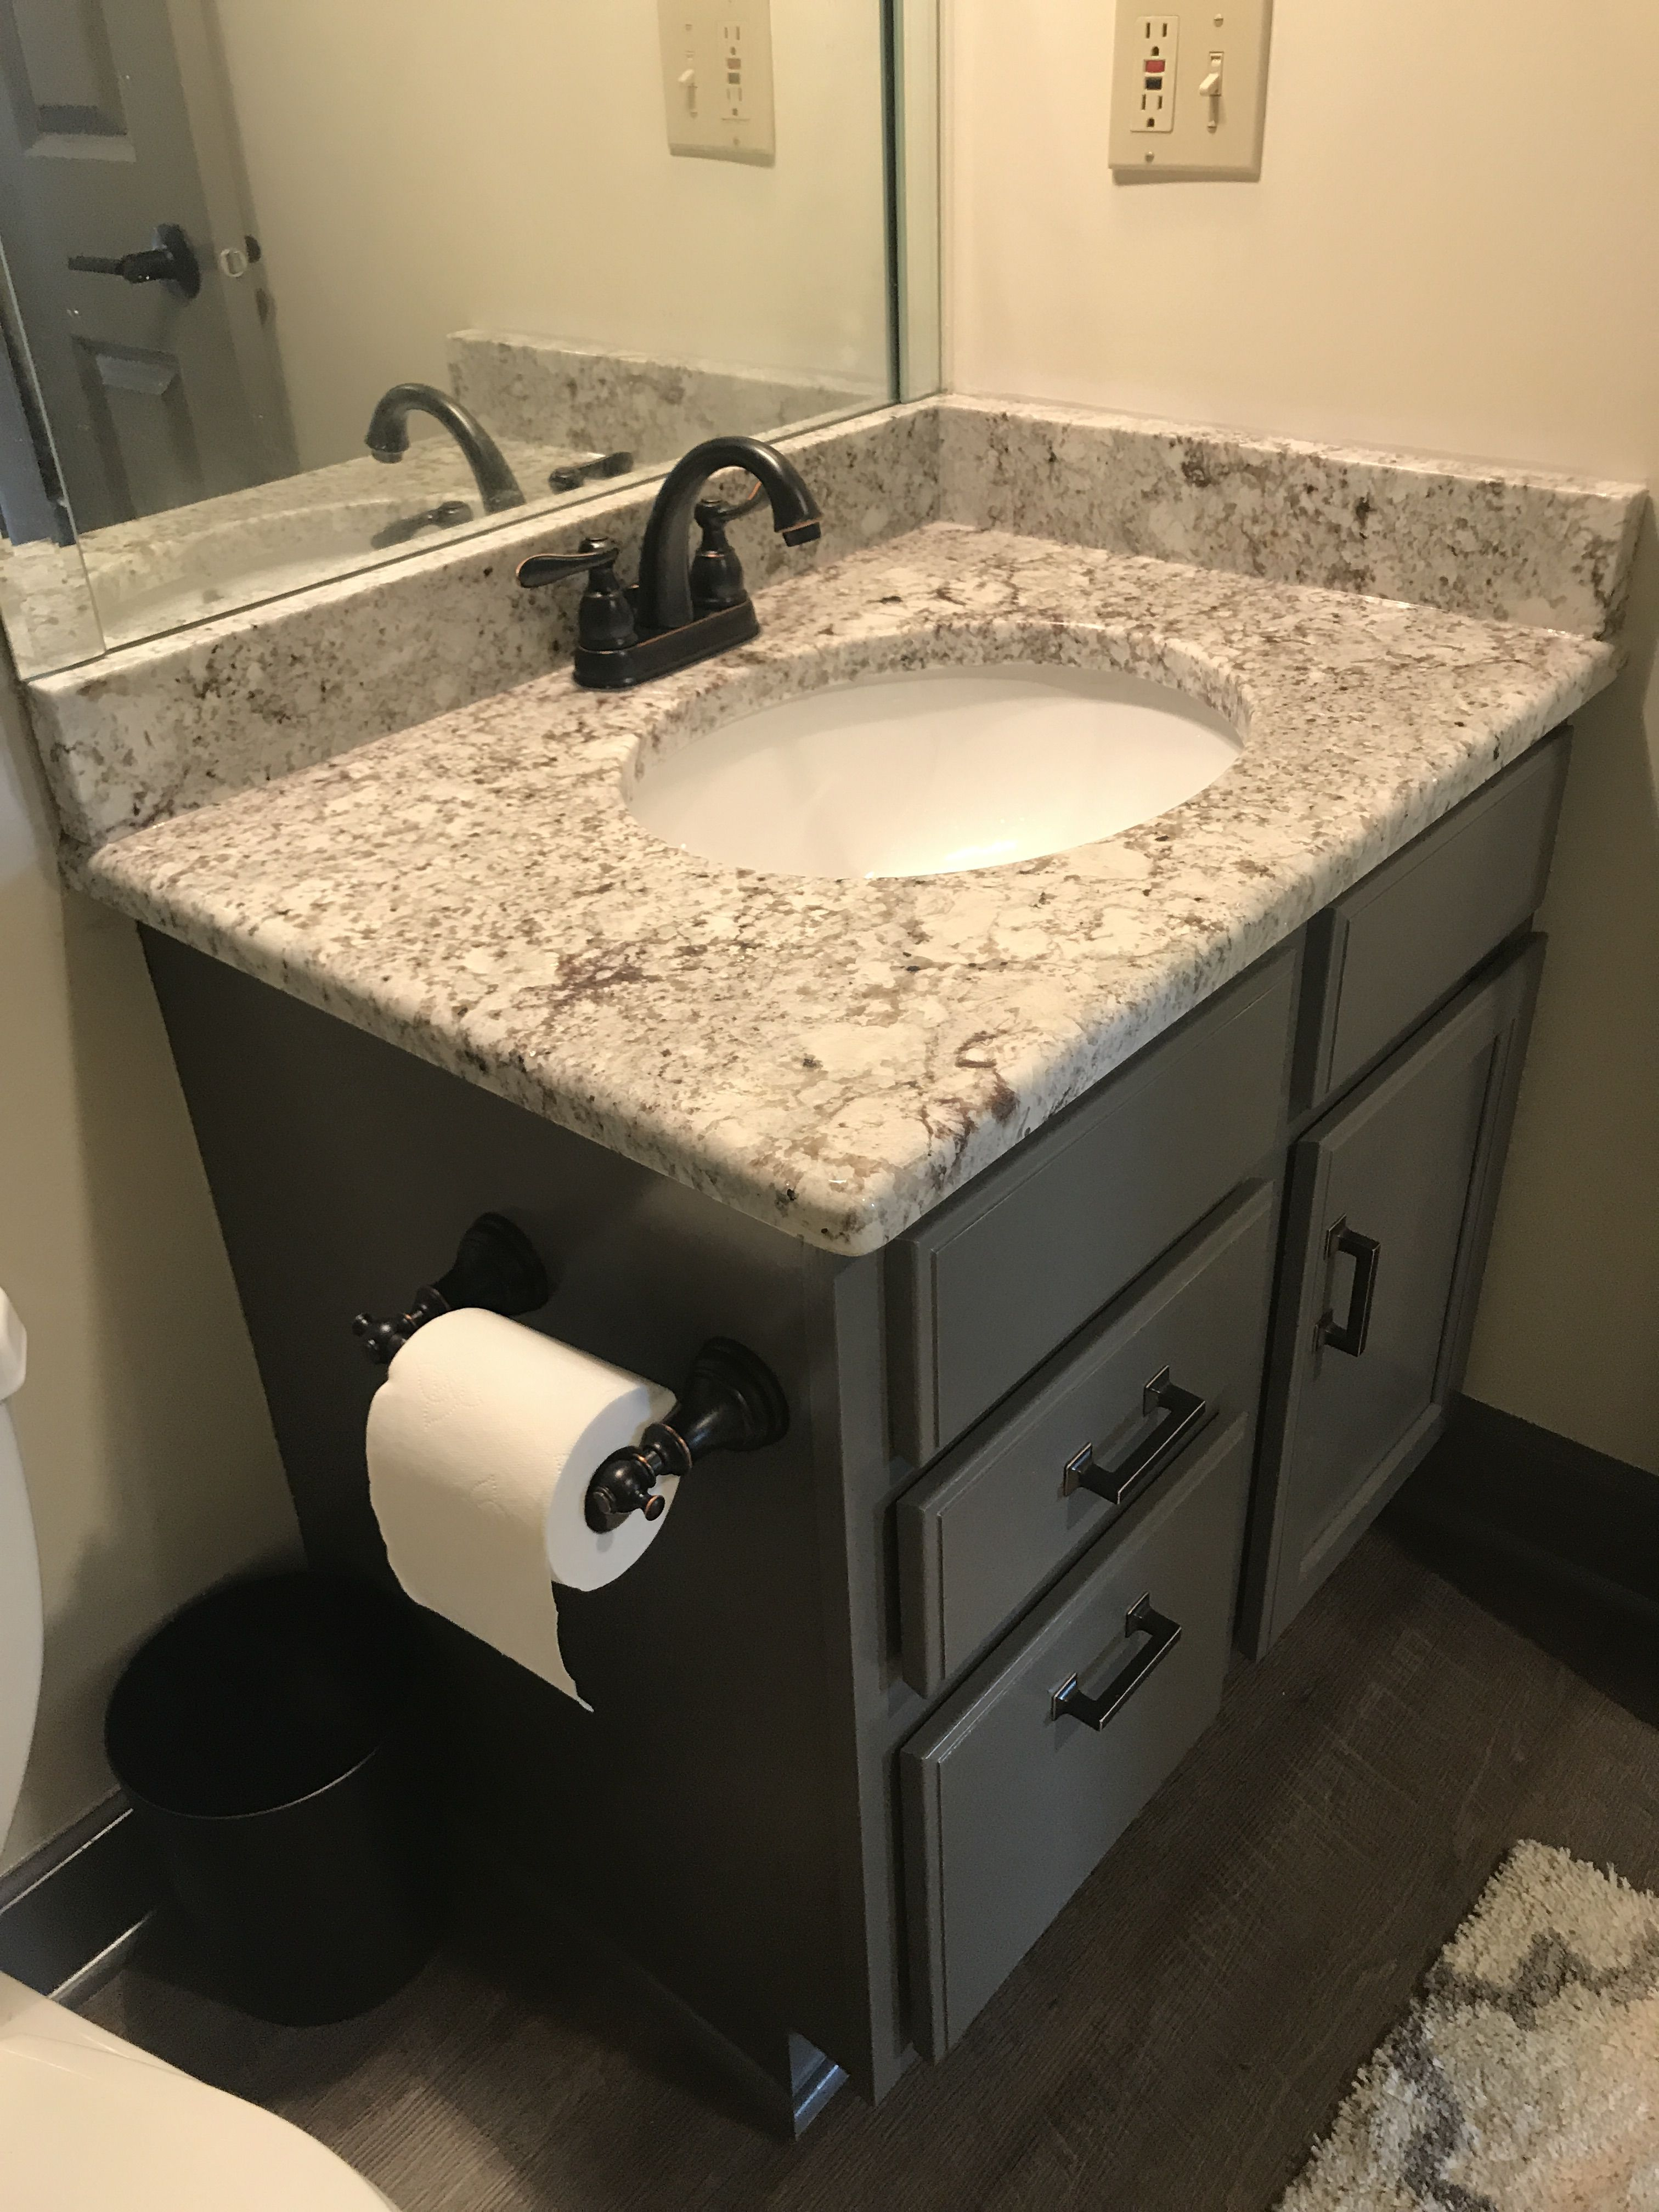 Bathroom Vanity Refinished In Sherwin Williams Gauntlet Gray Gauntlet Gray Sherwin Williams Gauntlet Gray Grey Bathroom Vanity